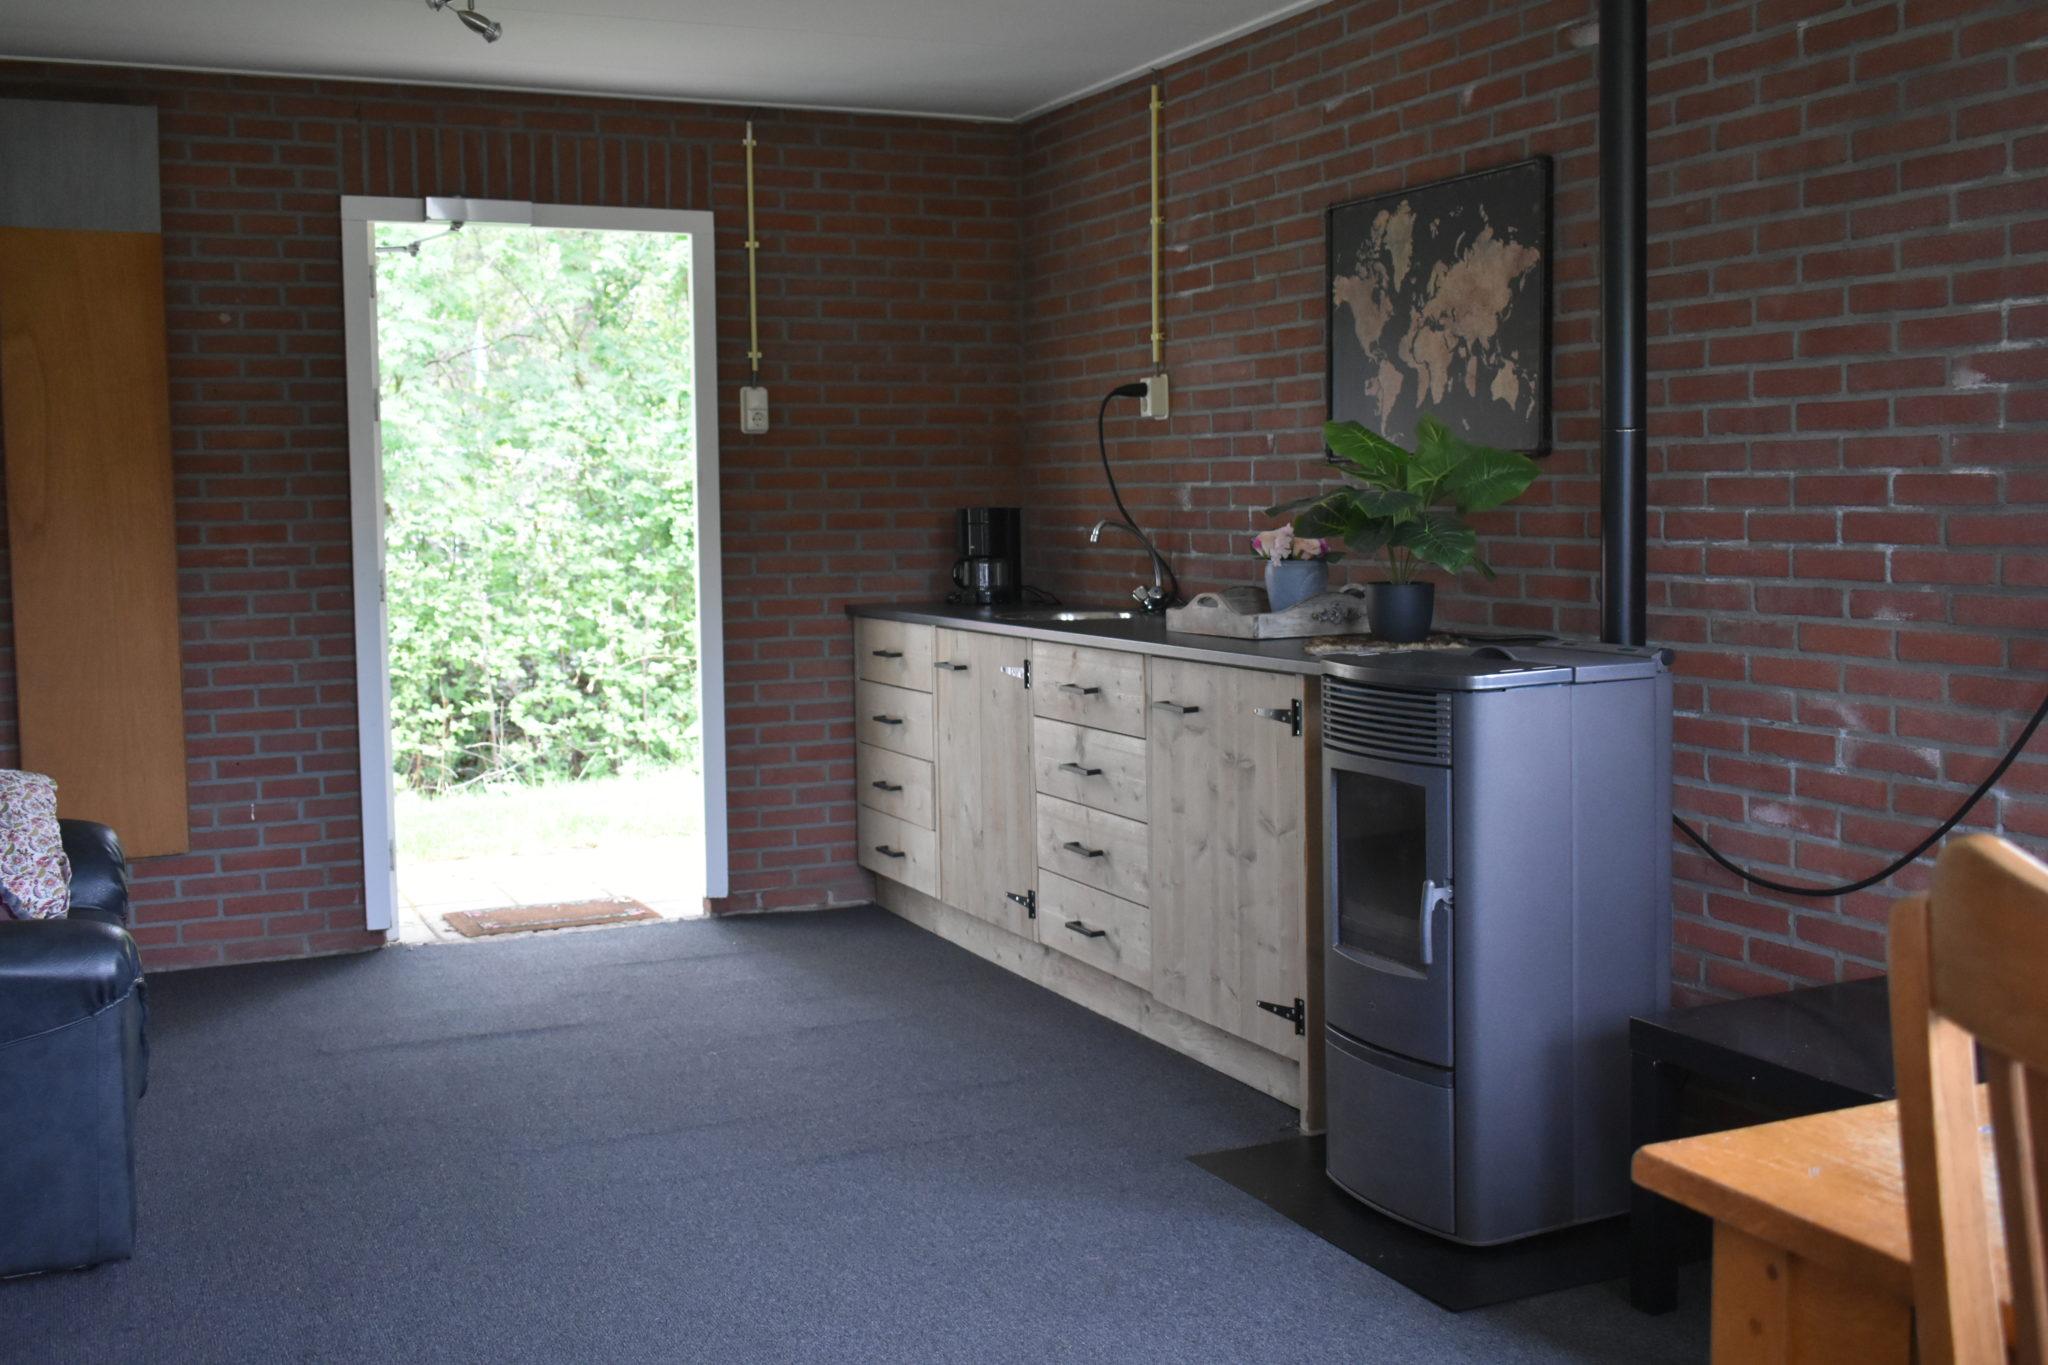 camping harminahoeve recreatieruimte binnen keuken